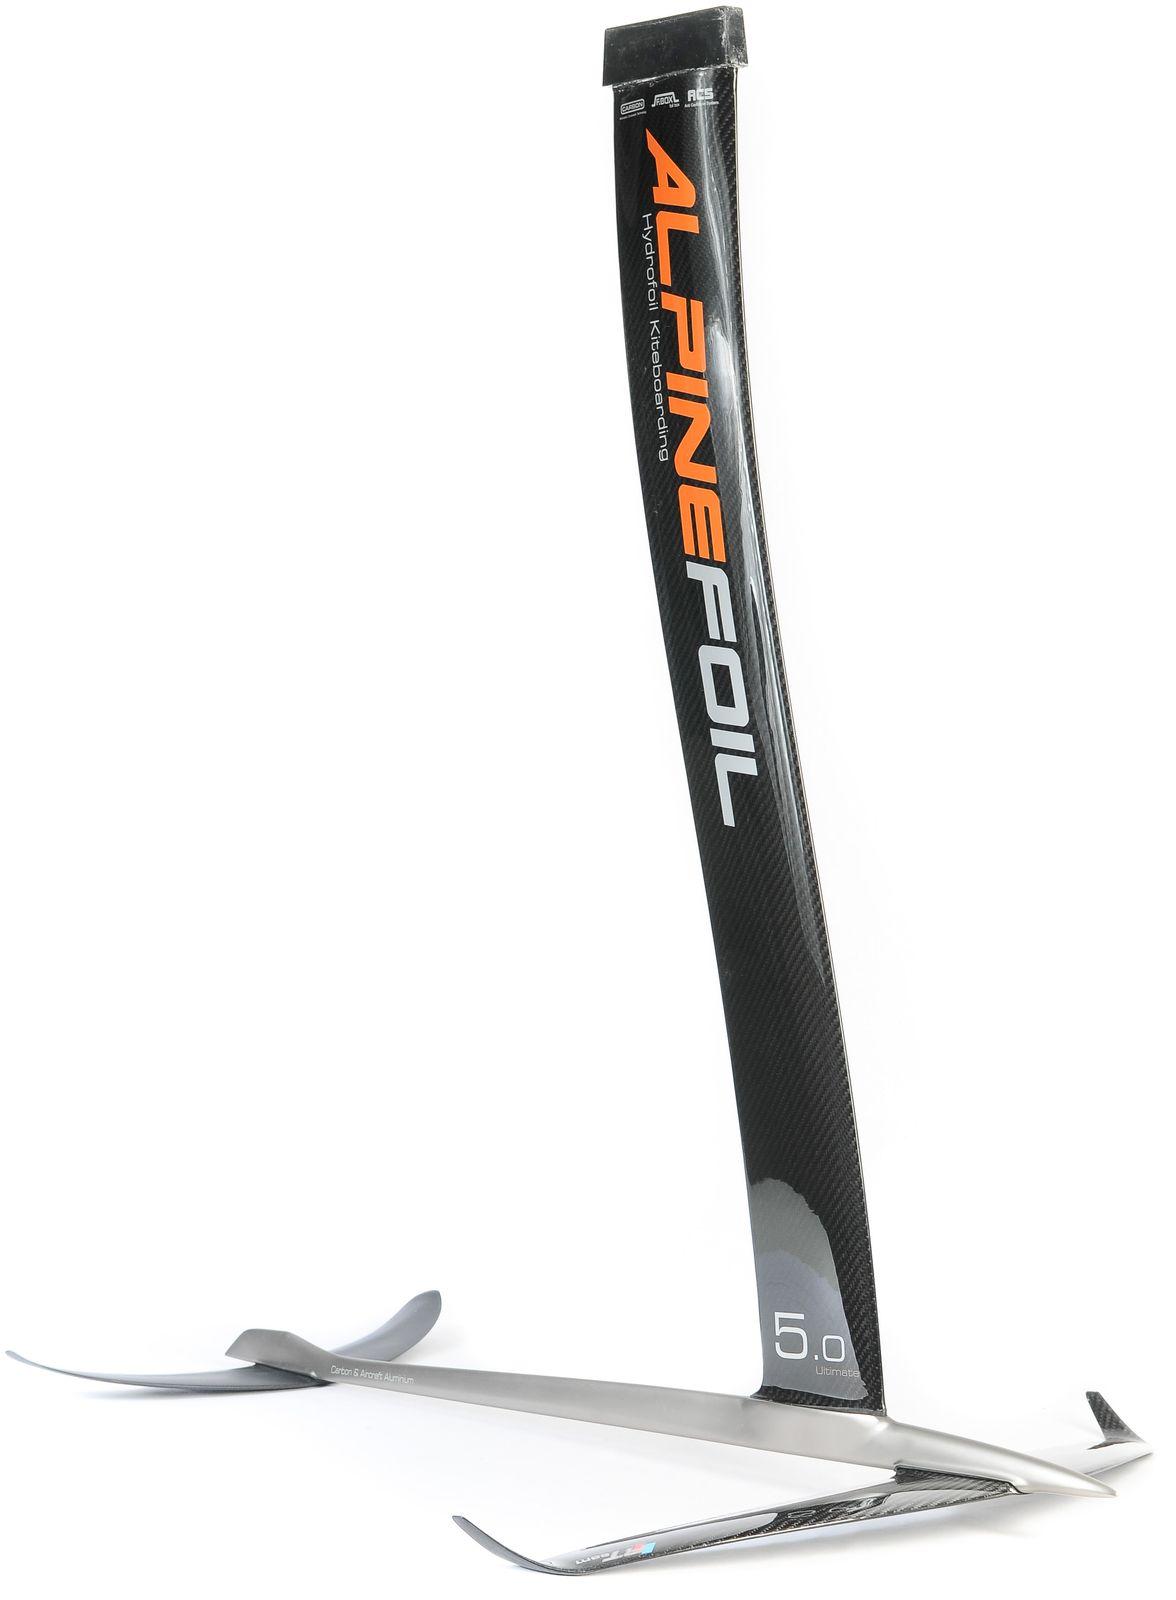 Kitefoil alpinefoil carbon aluminium gis ultimate 2 resultat